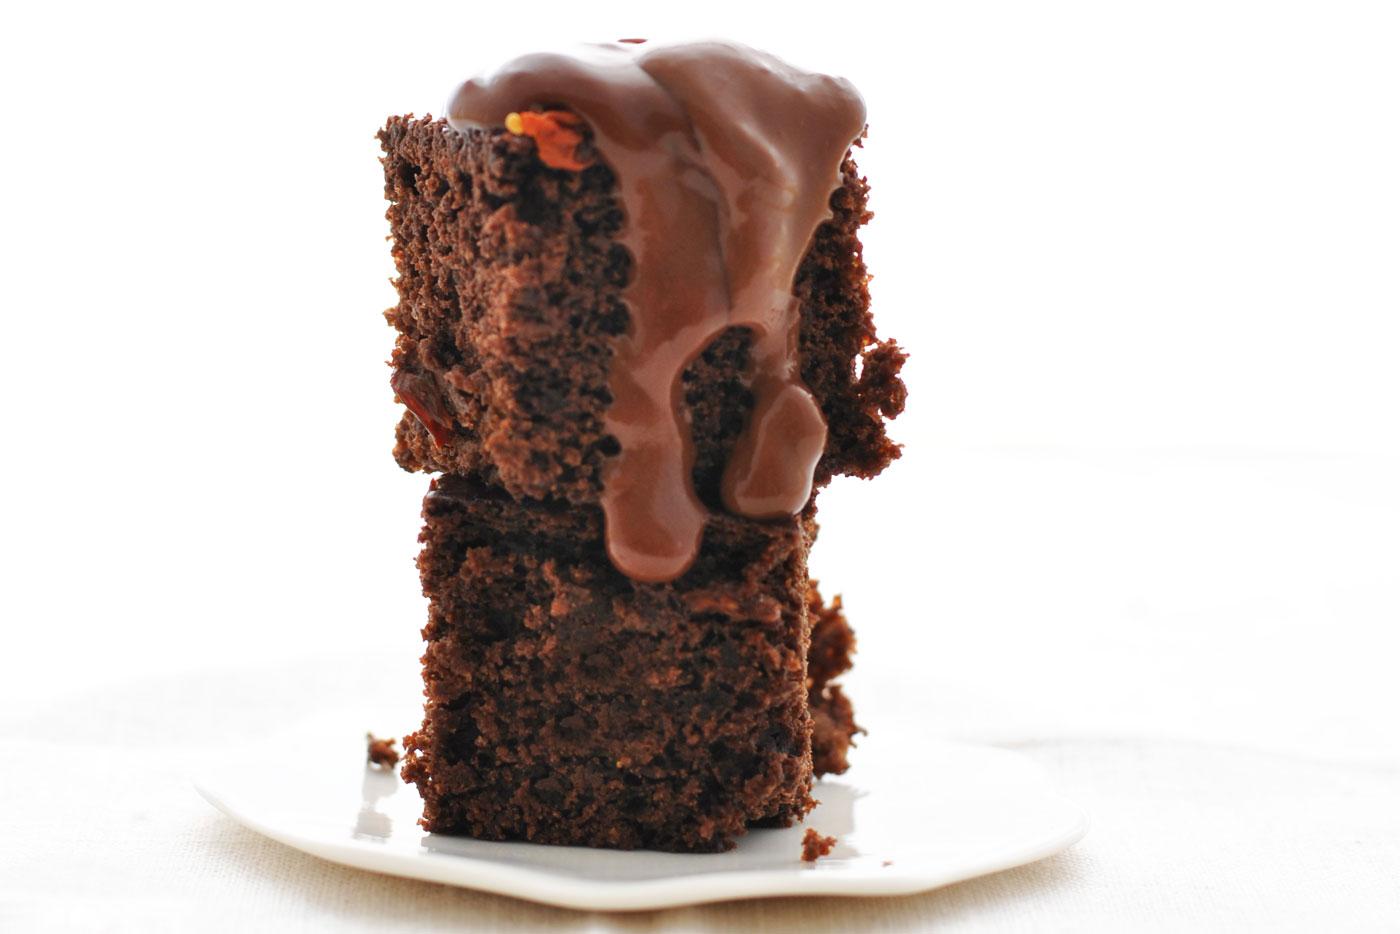 Torta-cioccolato-img-post-4